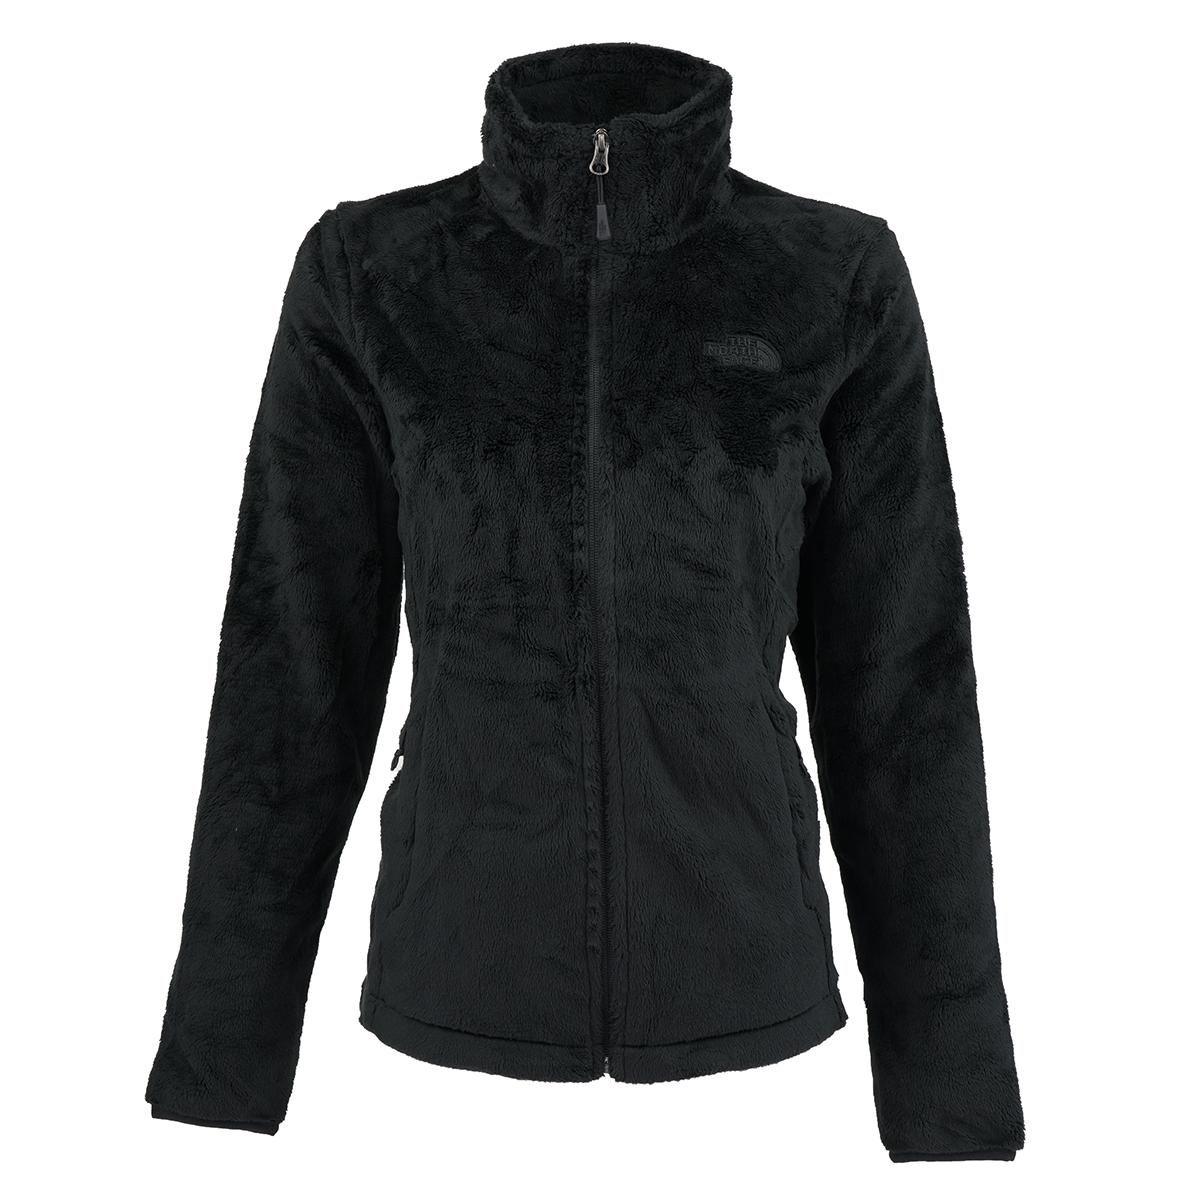 The-North-Face-Women-039-s-Osito-2-Fleece-Jacket